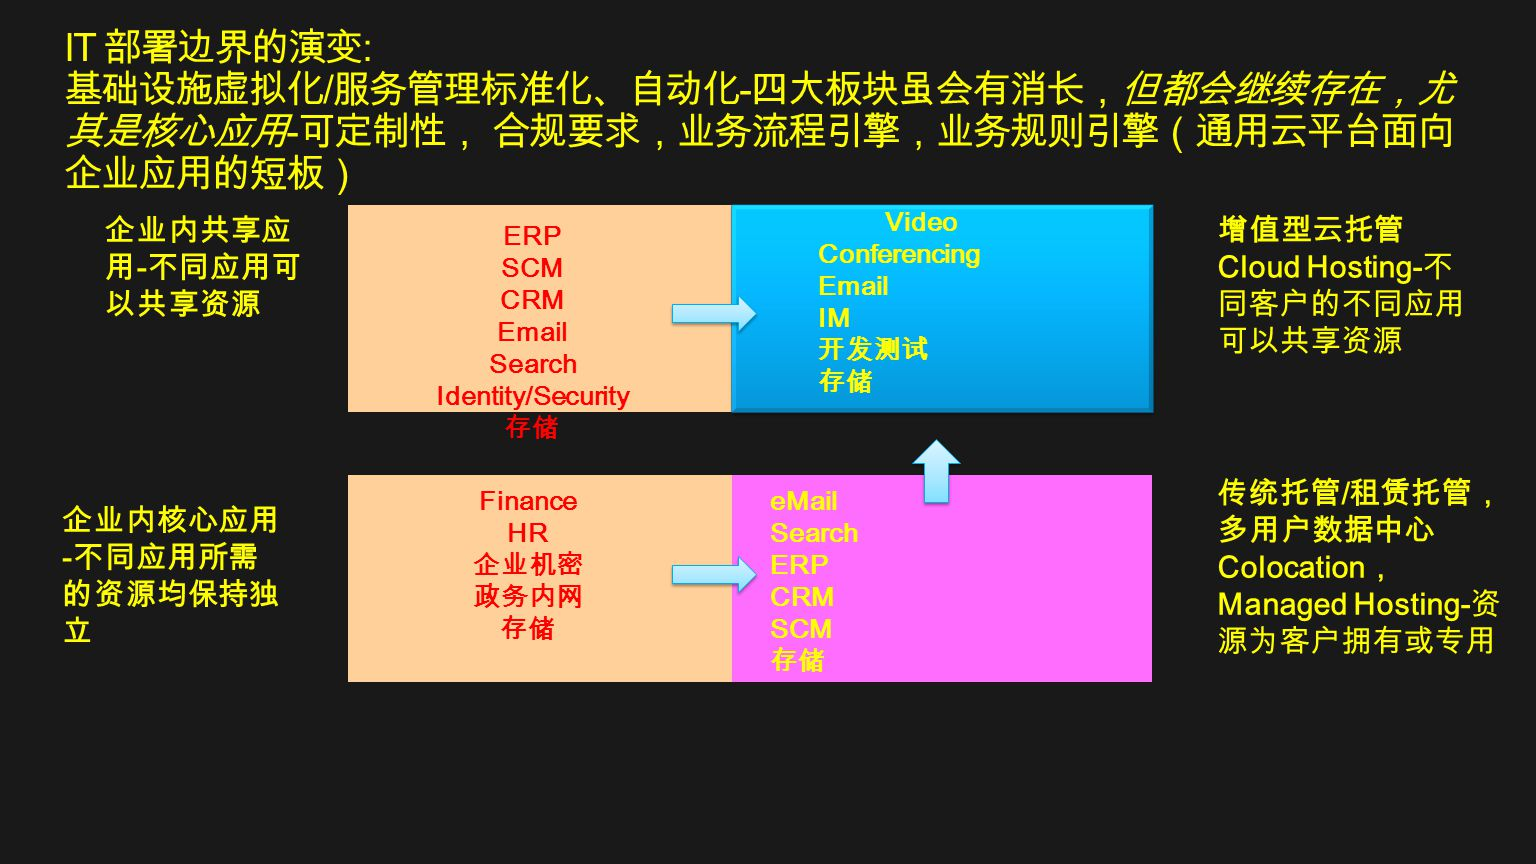 IT 部署边界的演变: 基础设施虚拟化/服务管理标准化、自动化-四大板块虽会有消长,但都会继续存在,尤其是核心应用-可定制性, 合规要求,业务流程引擎,业务规则引擎(通用云平台面向企业应用的短板)